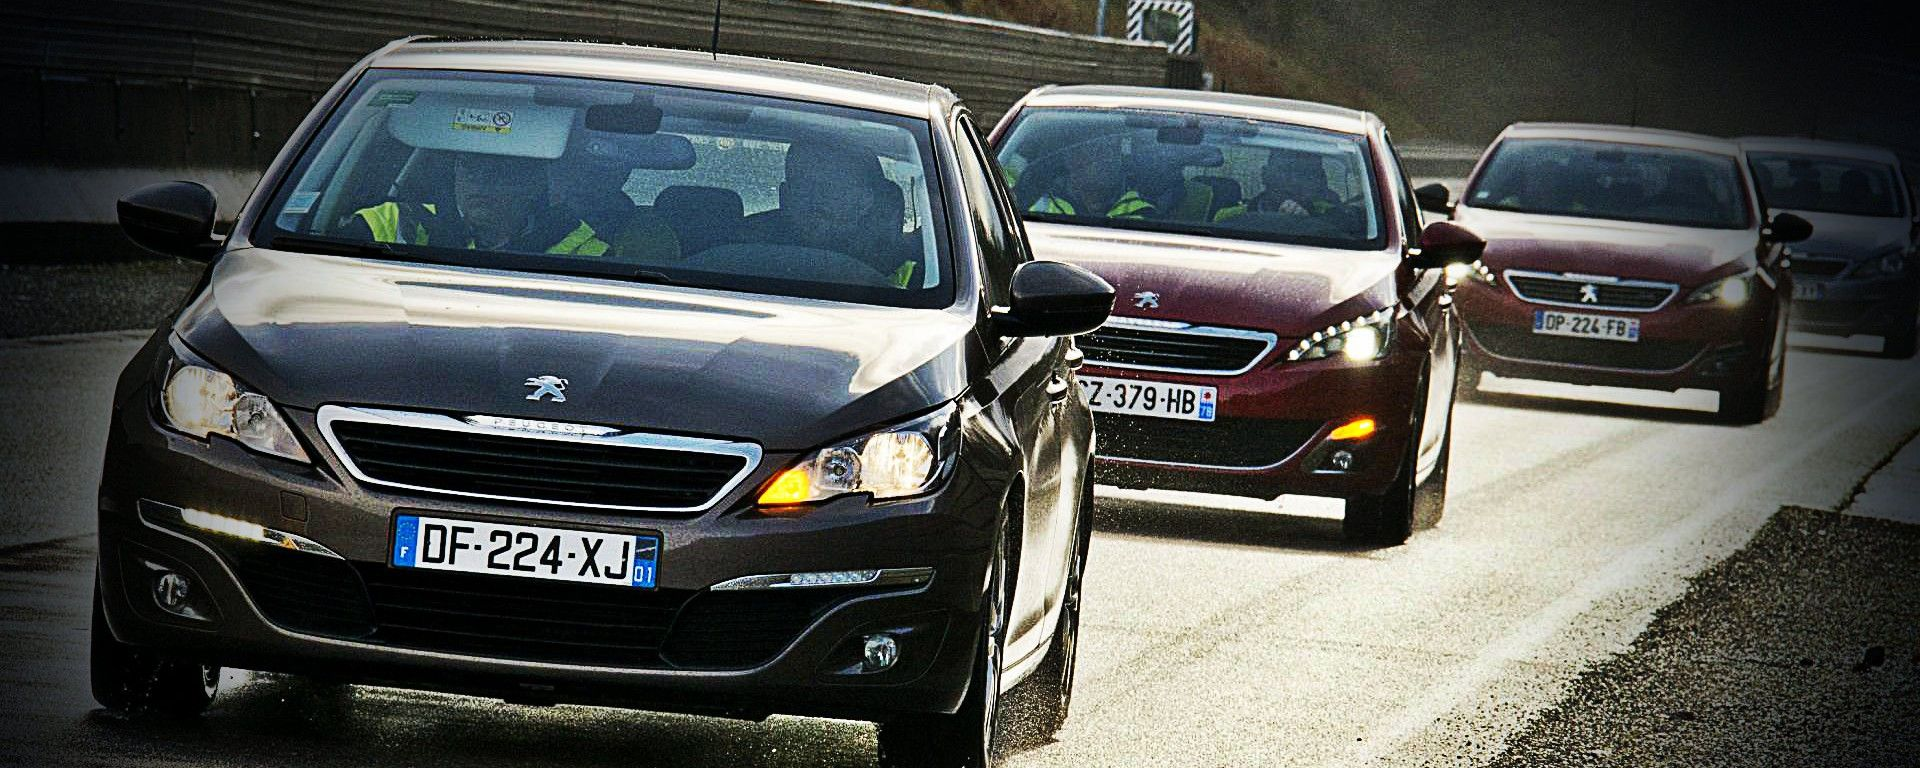 Peugeot 308: la prova qualità